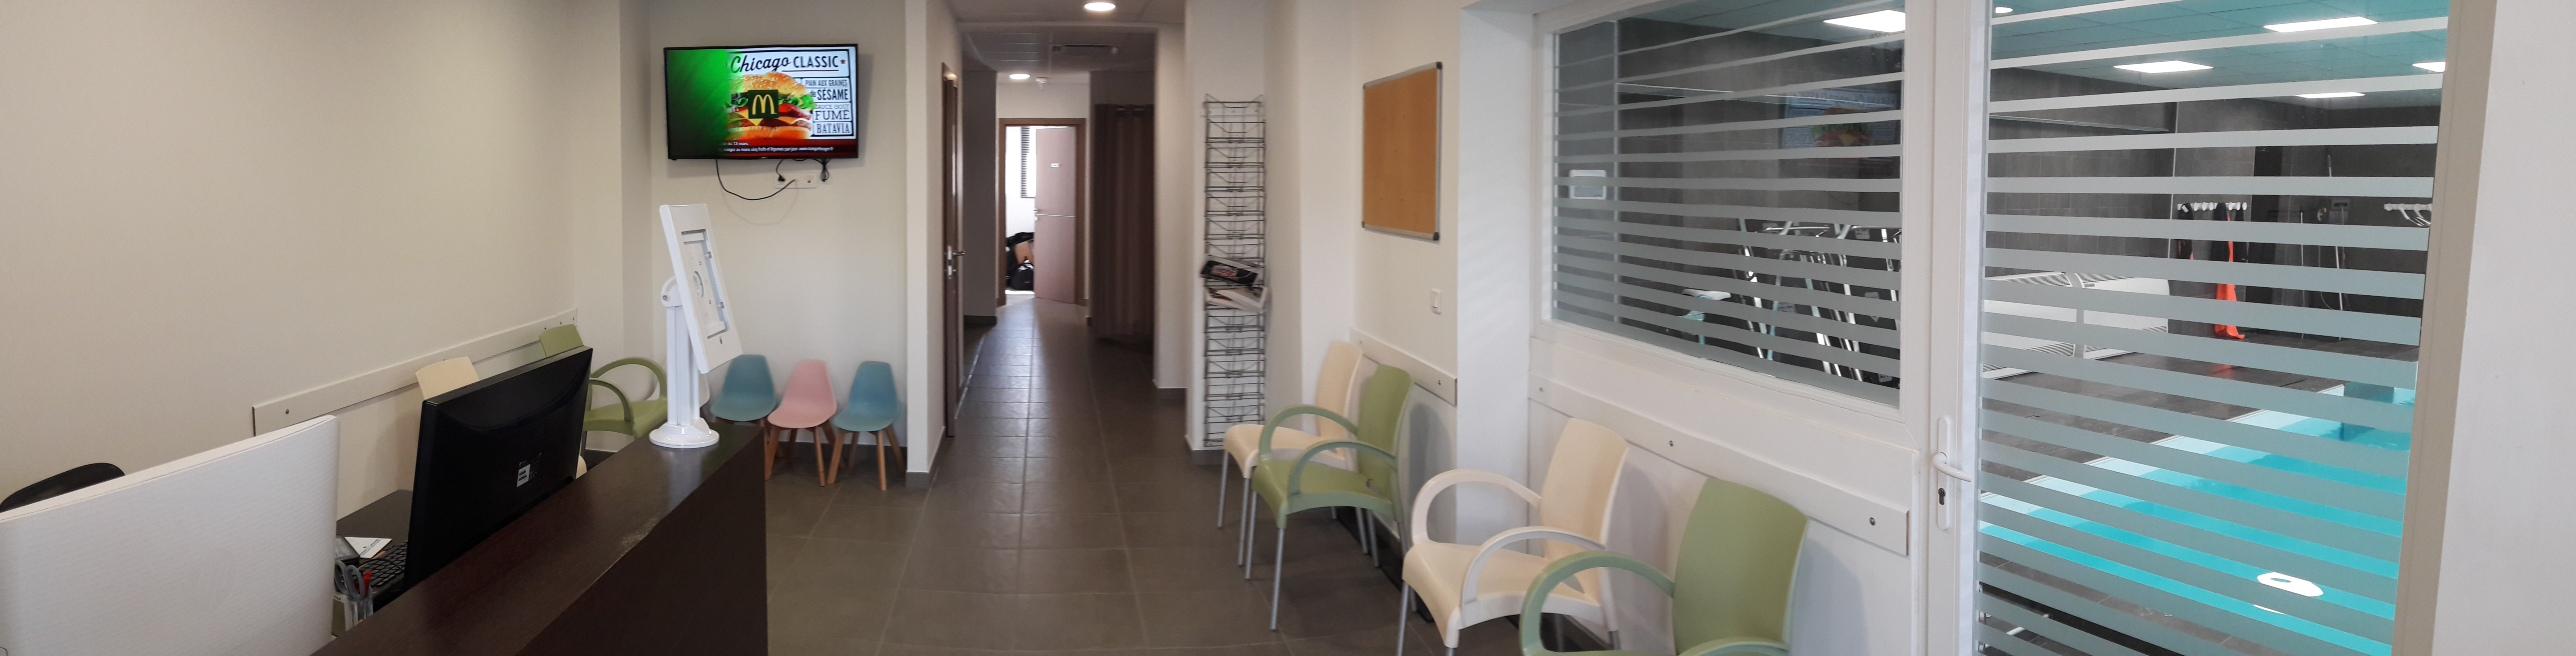 ka petites annonces hors offres d 39 emploi. Black Bedroom Furniture Sets. Home Design Ideas